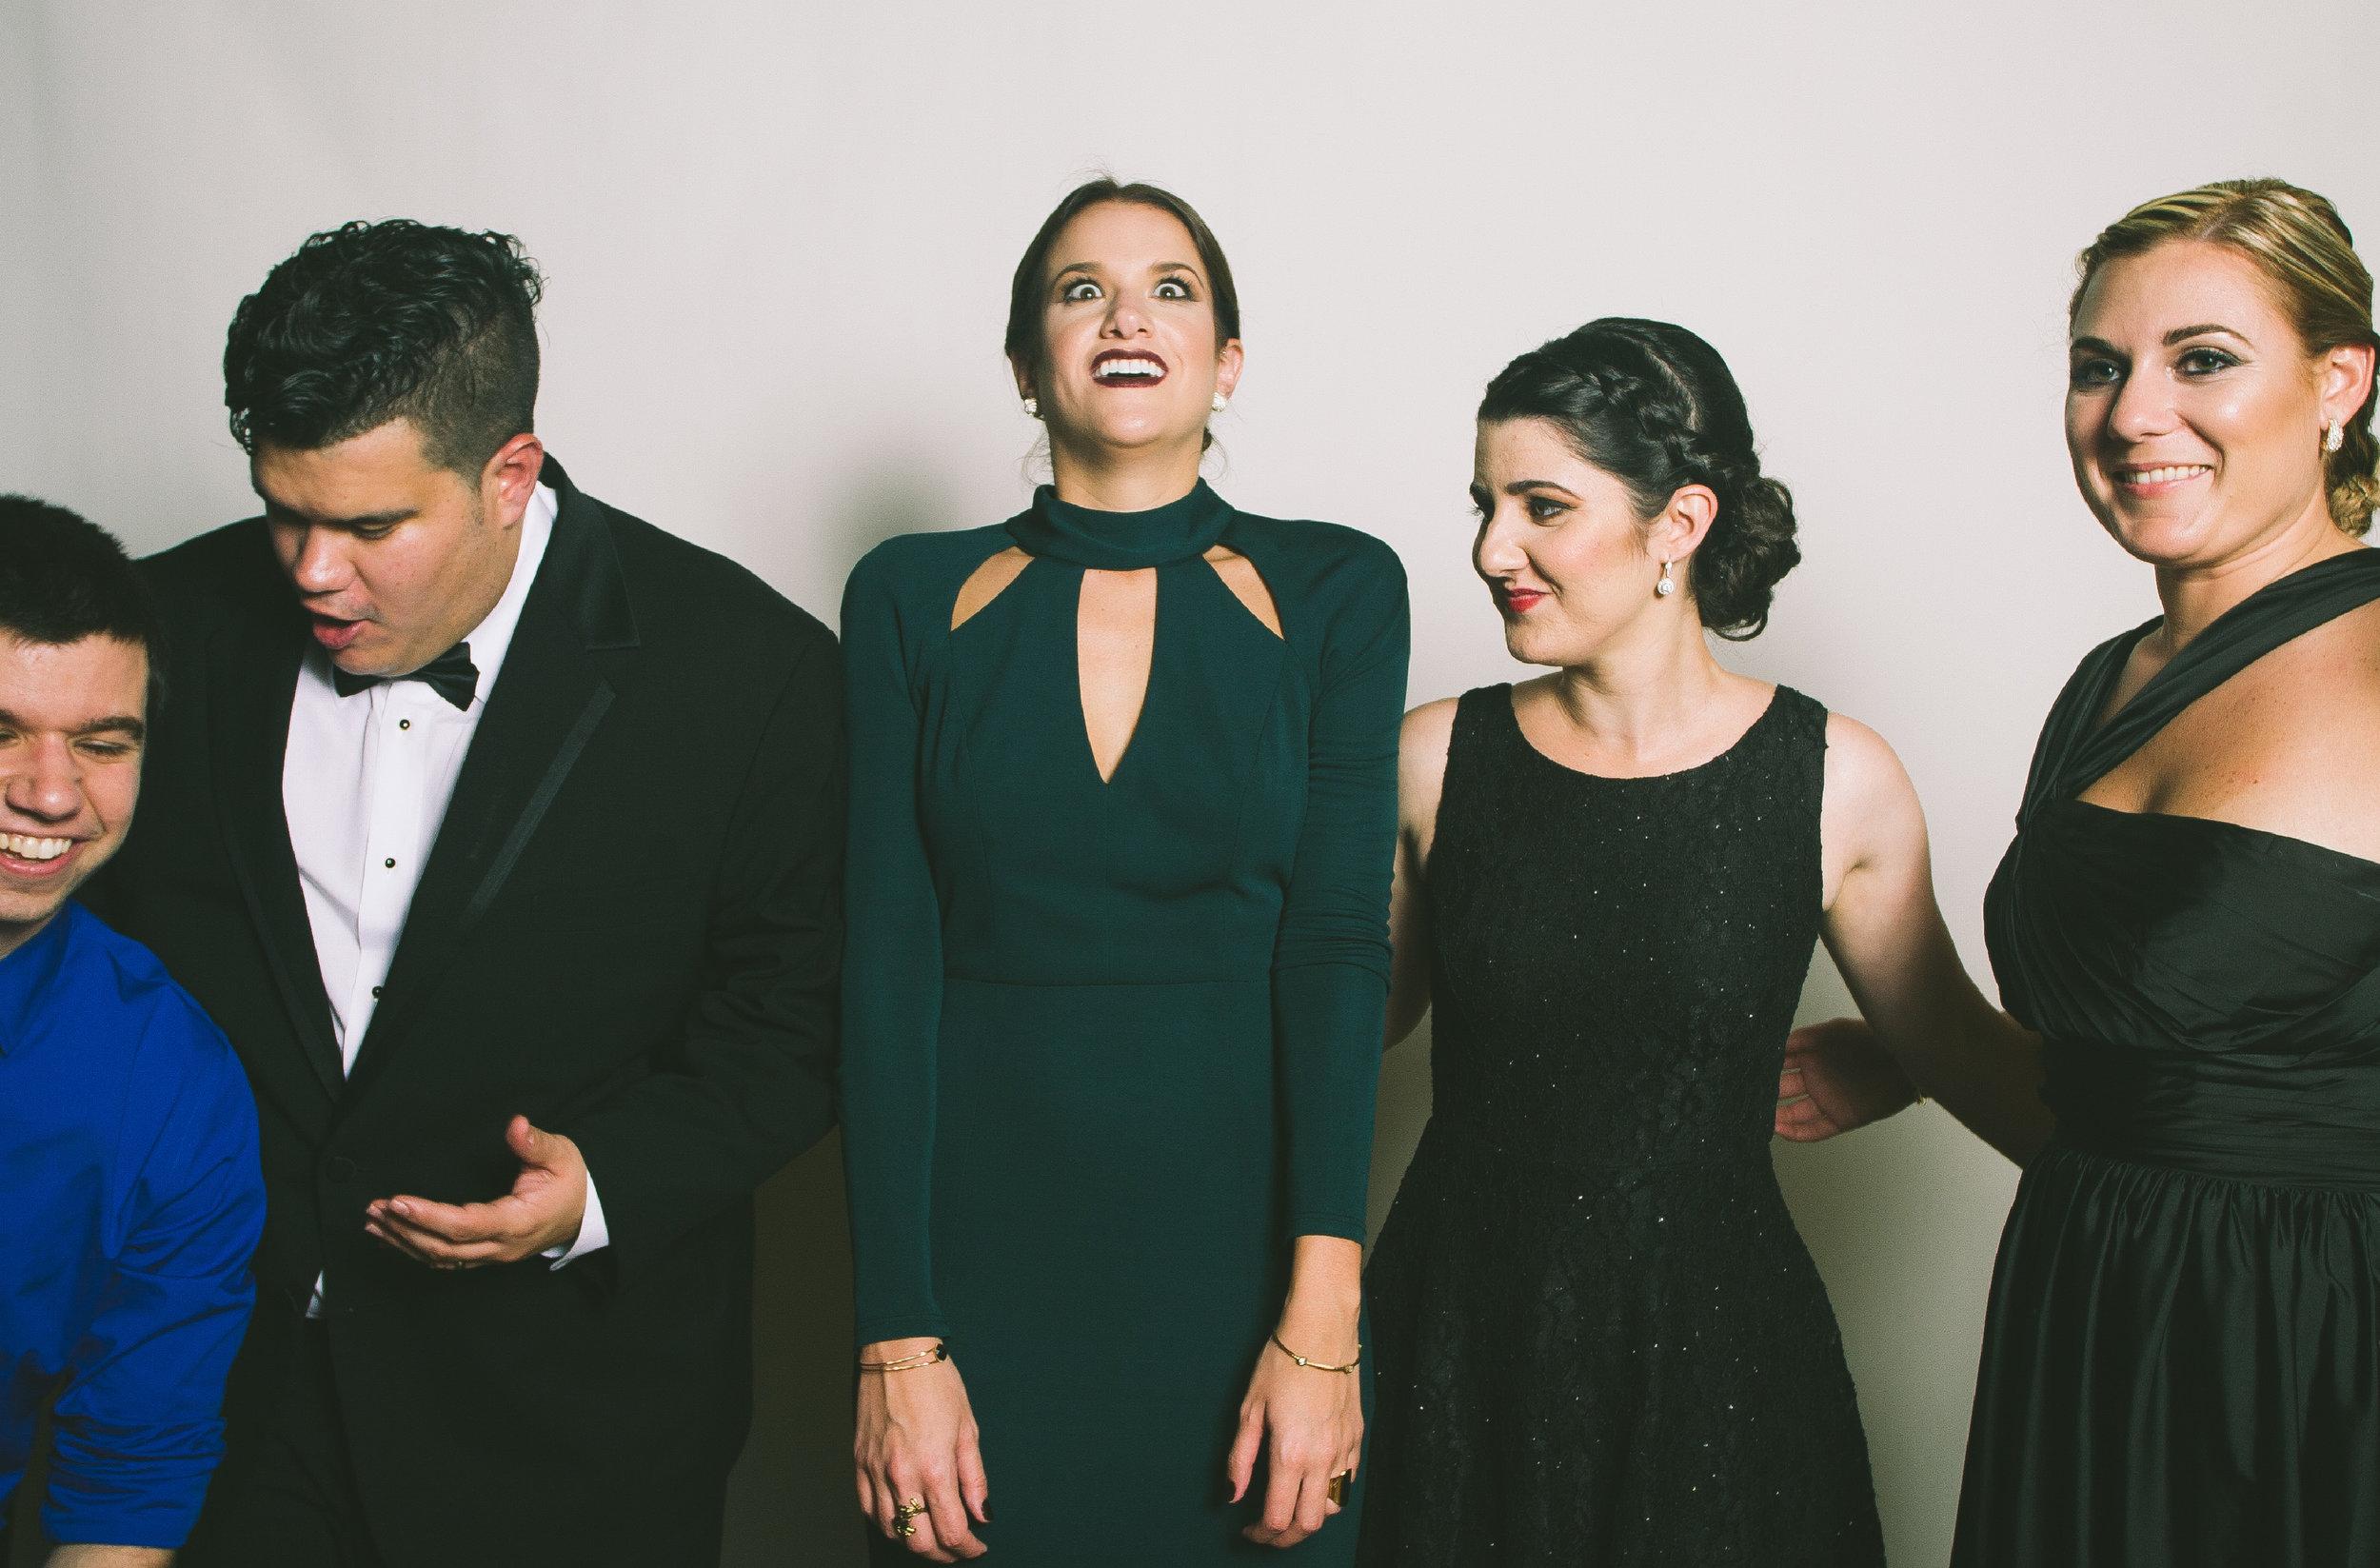 Marelys + Oscar Wedding Wackybooth Photobooth27.jpg